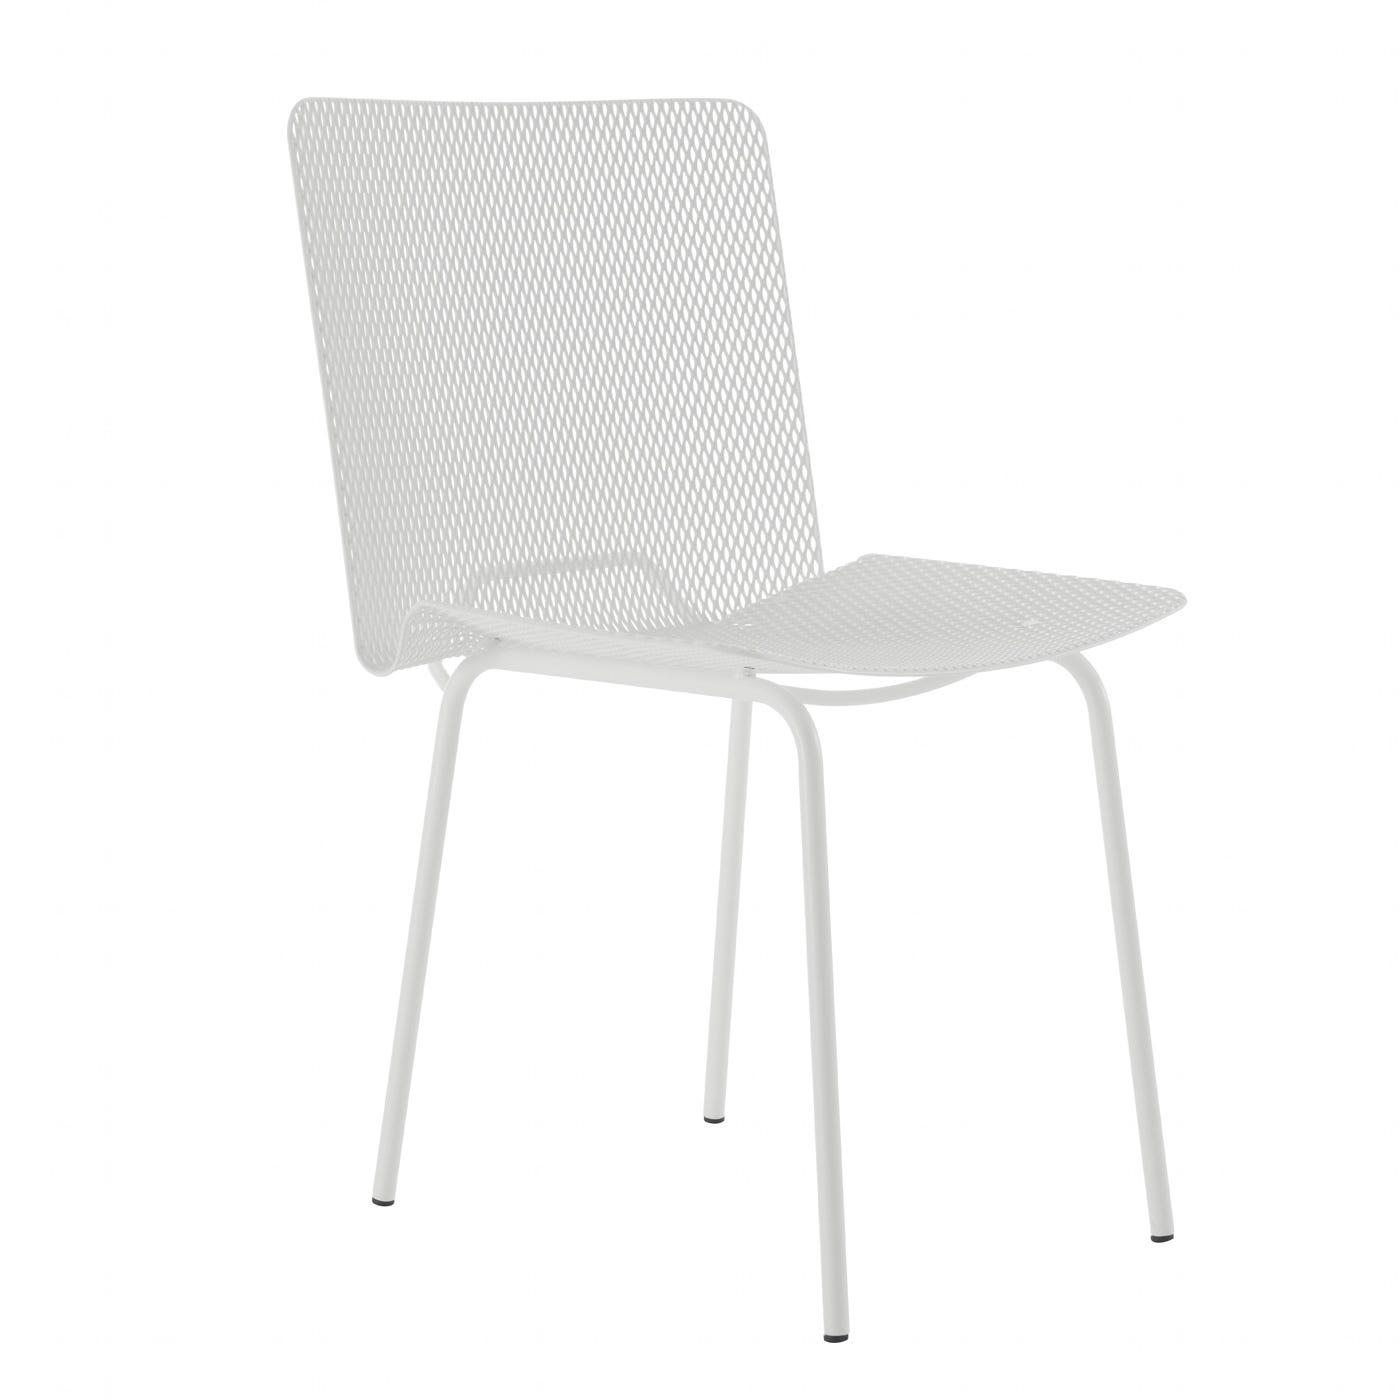 Ligne Roset Grillage Set of 2 Chairs White